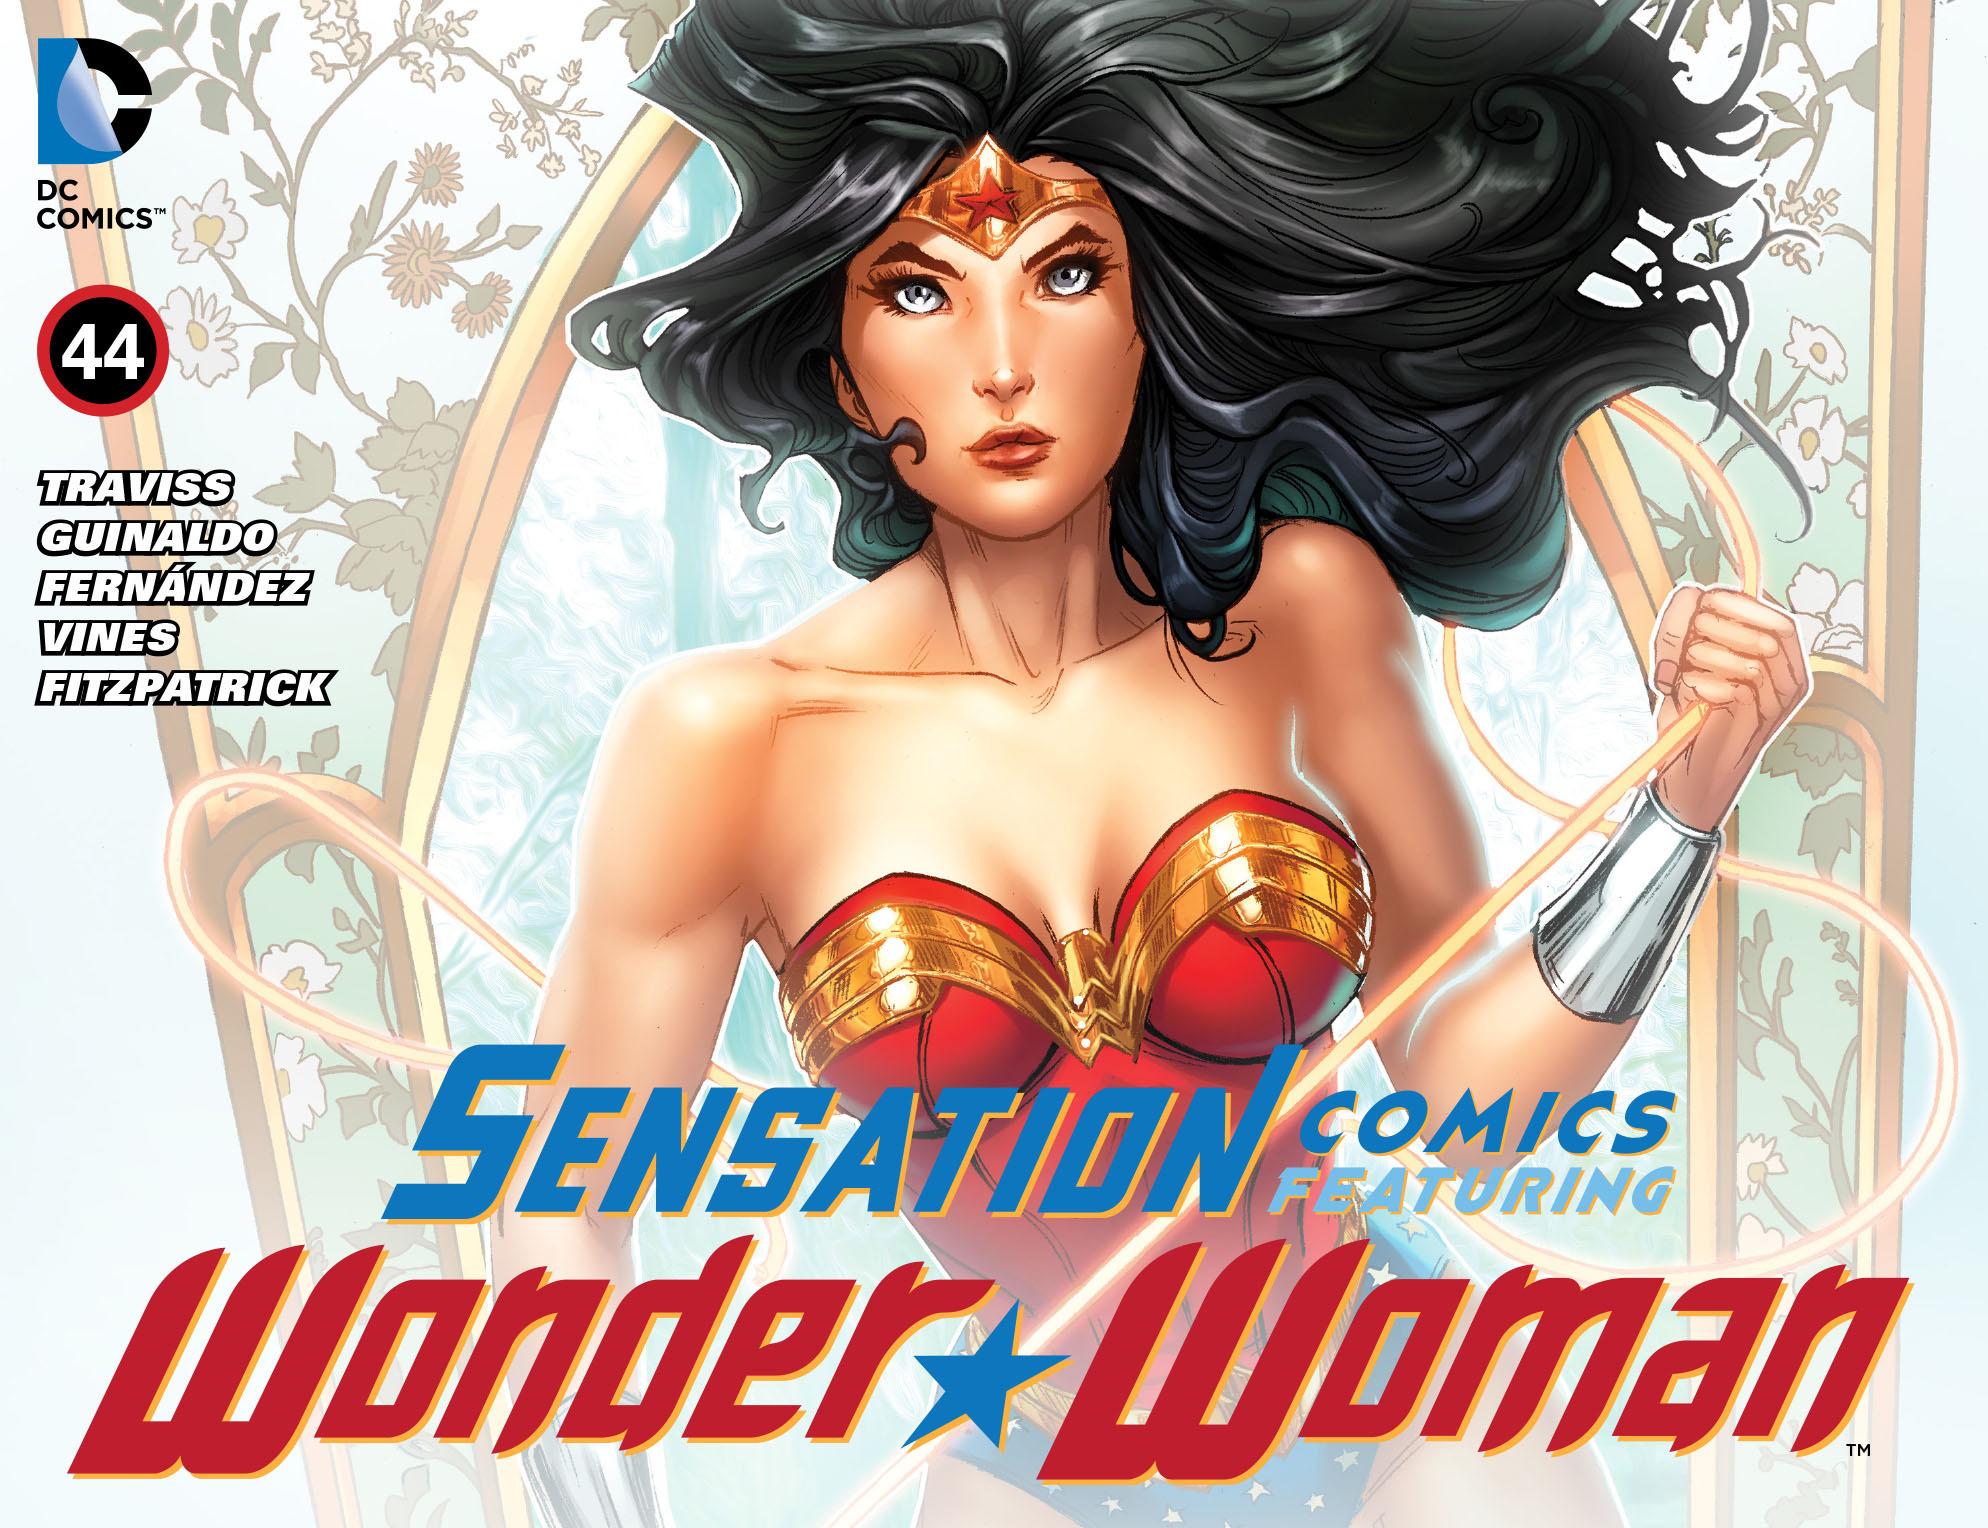 Read online Sensation Comics Featuring Wonder Woman comic -  Issue #44 - 1